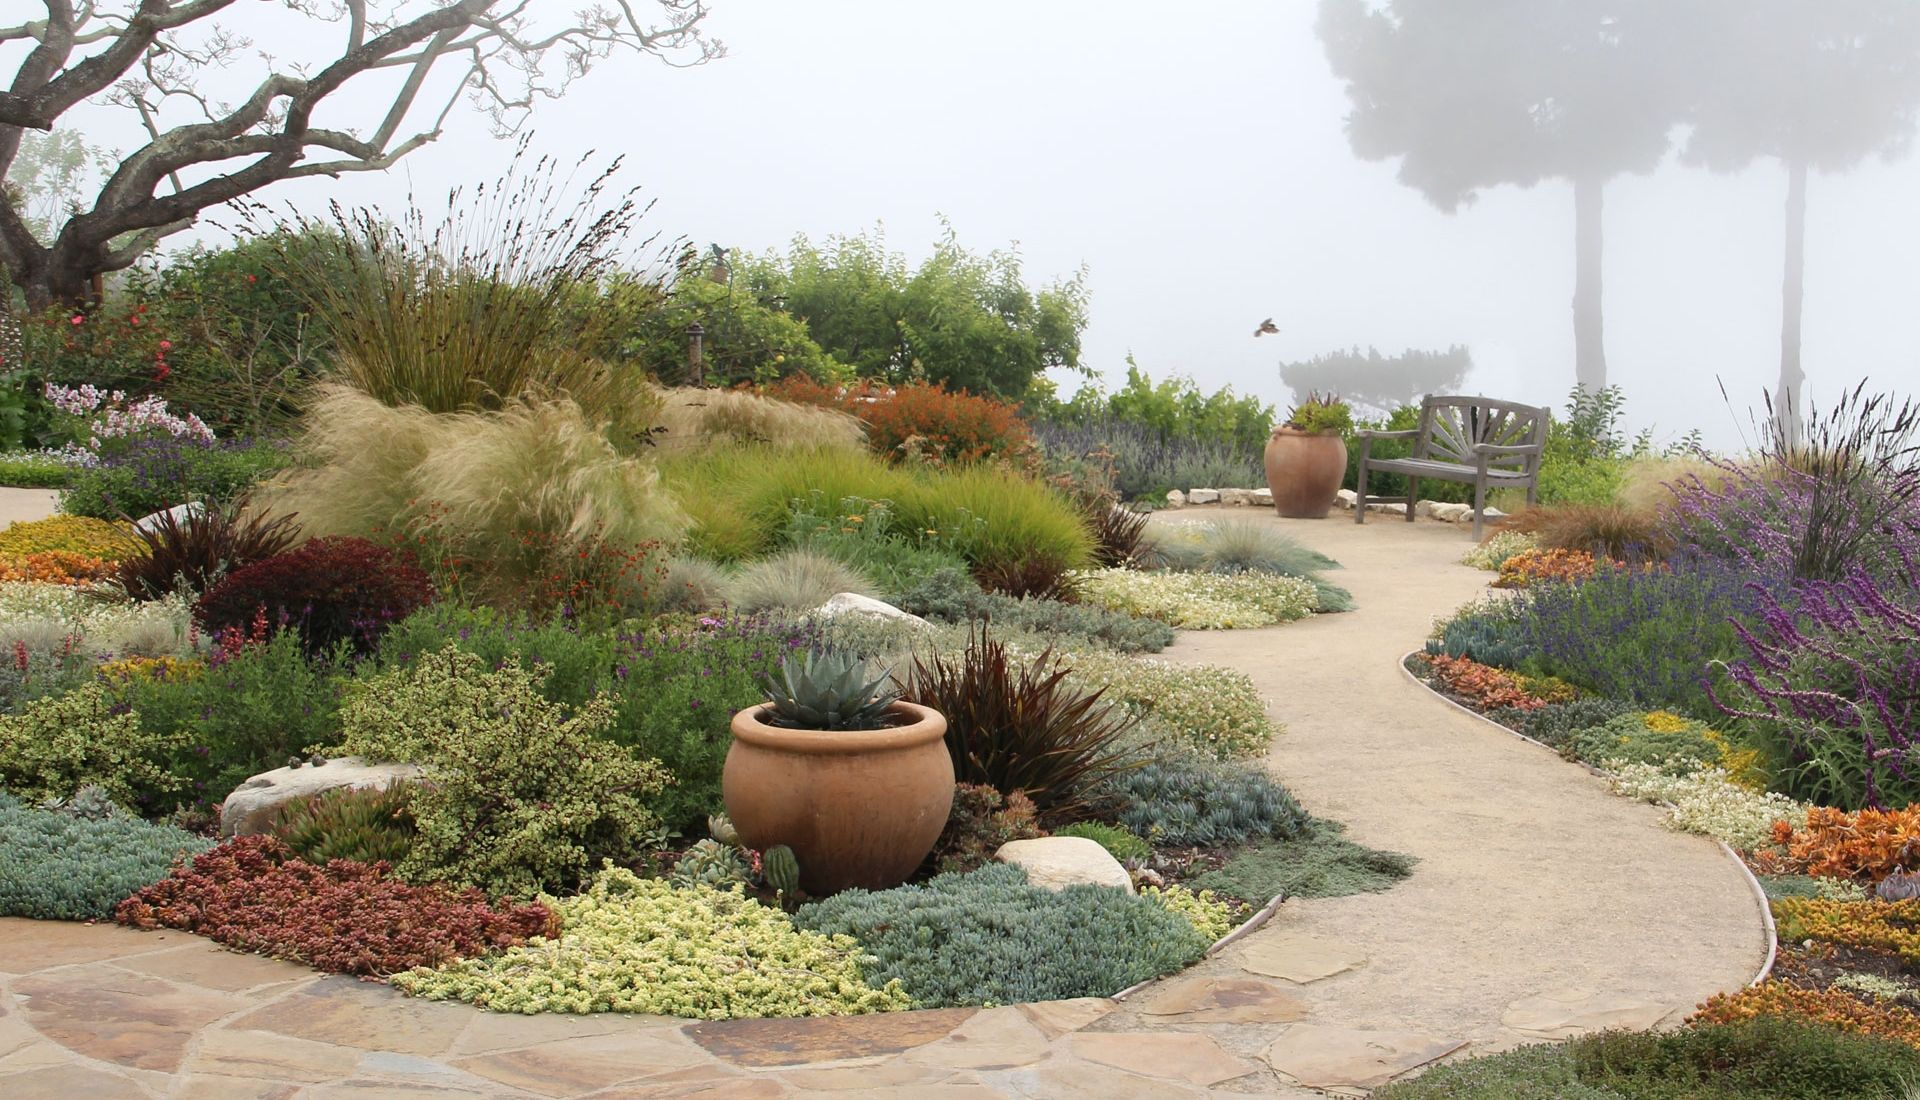 Bliss Garden Design Dry Garden Dry Garden Design Garden Design Dry Garden